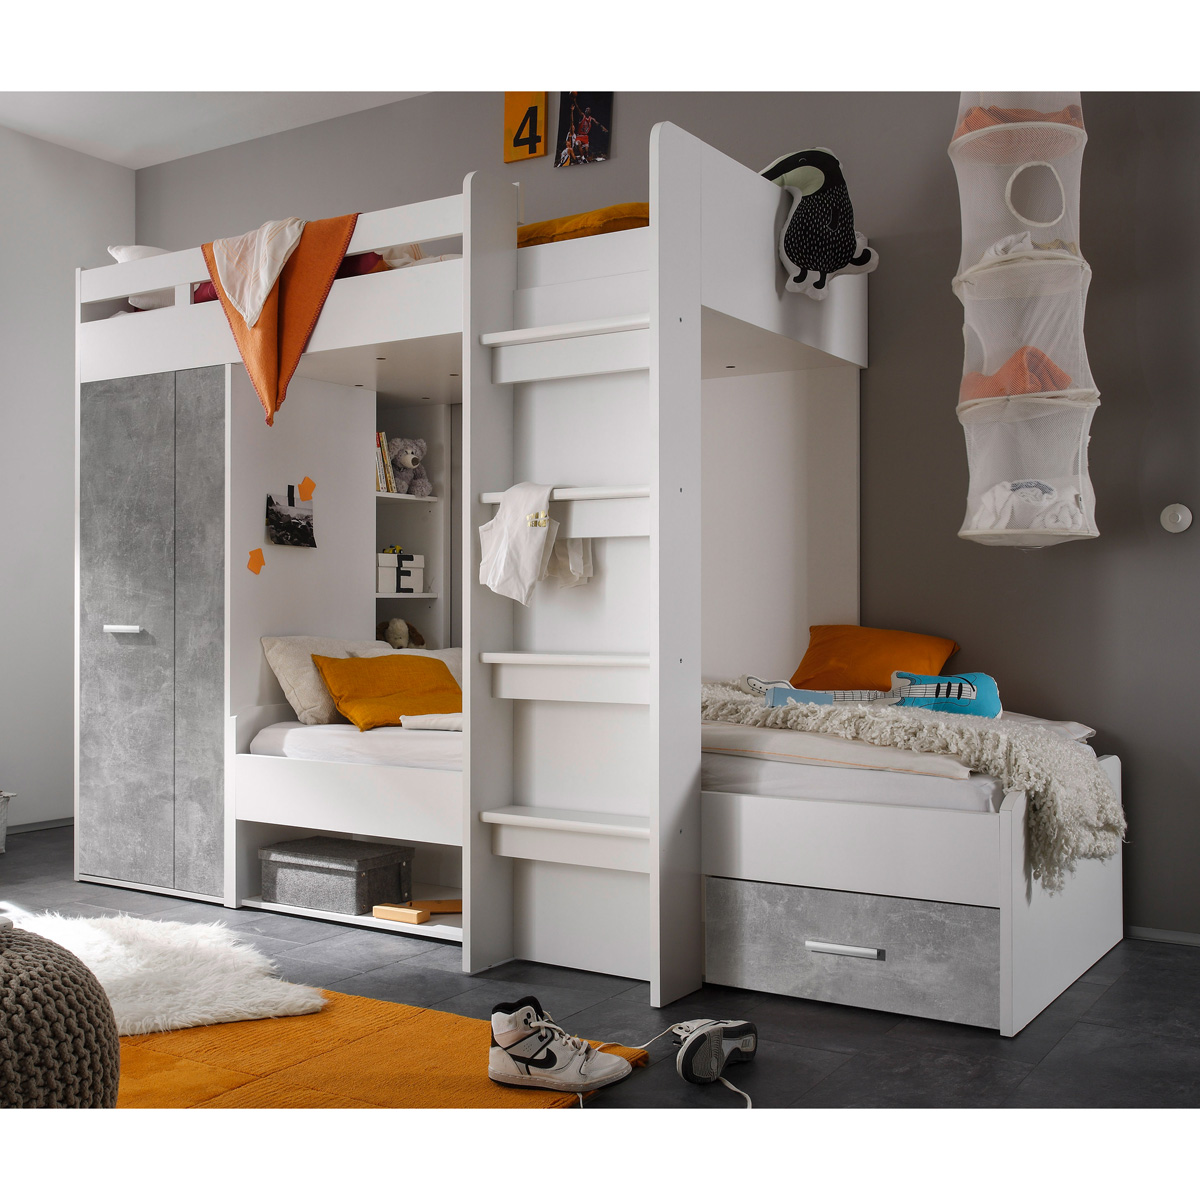 Etagenbett Maxi Kinderbett Hochbett Kinderzimmerbett Bett weiß Beton ...